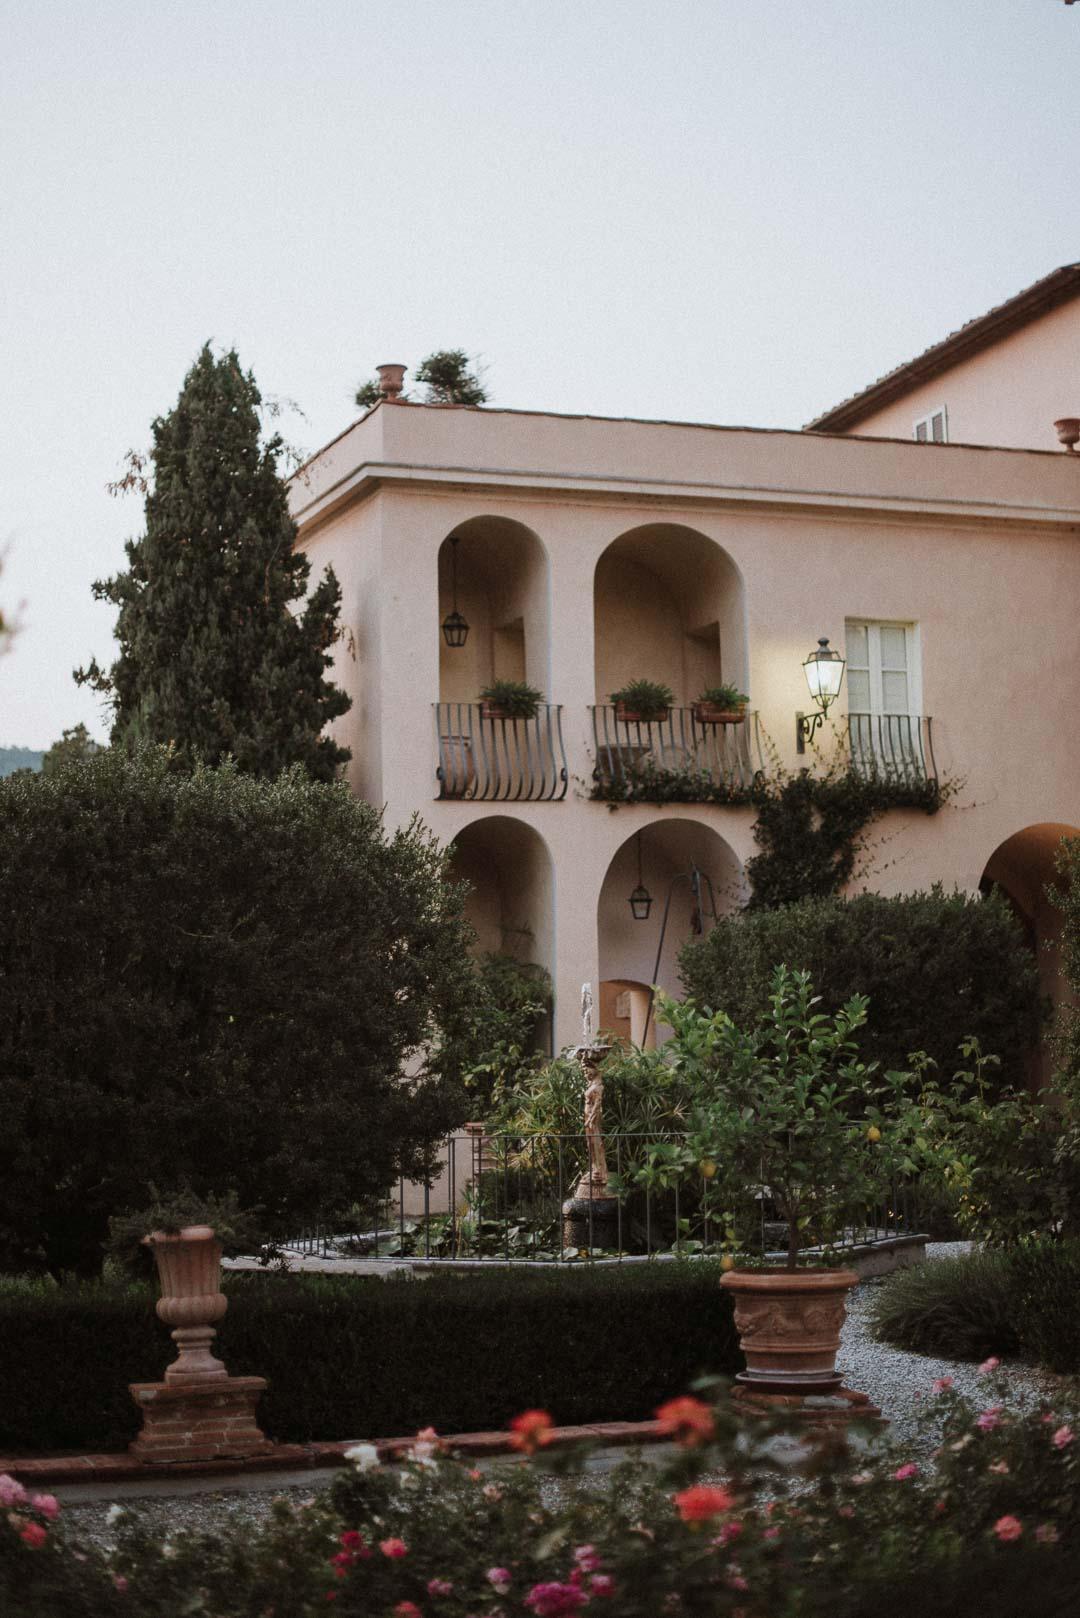 wedding-photographer-destination-fineart-bespoke-reportage-tuscany-villascorzi-vivianeizzo-spazio46-154